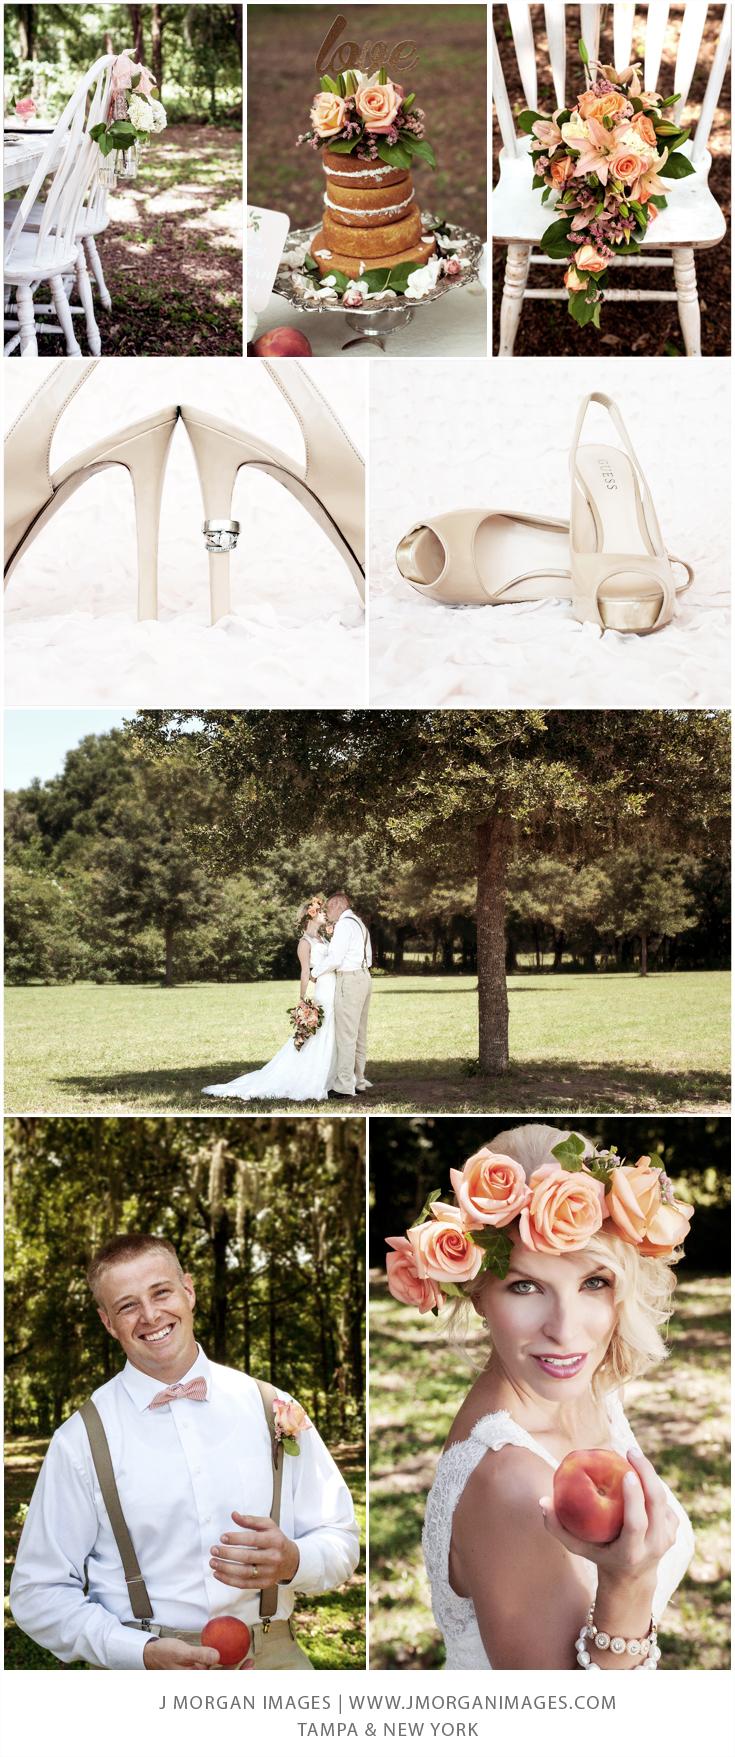 A Florida Peach Wedding by J Morgan Images